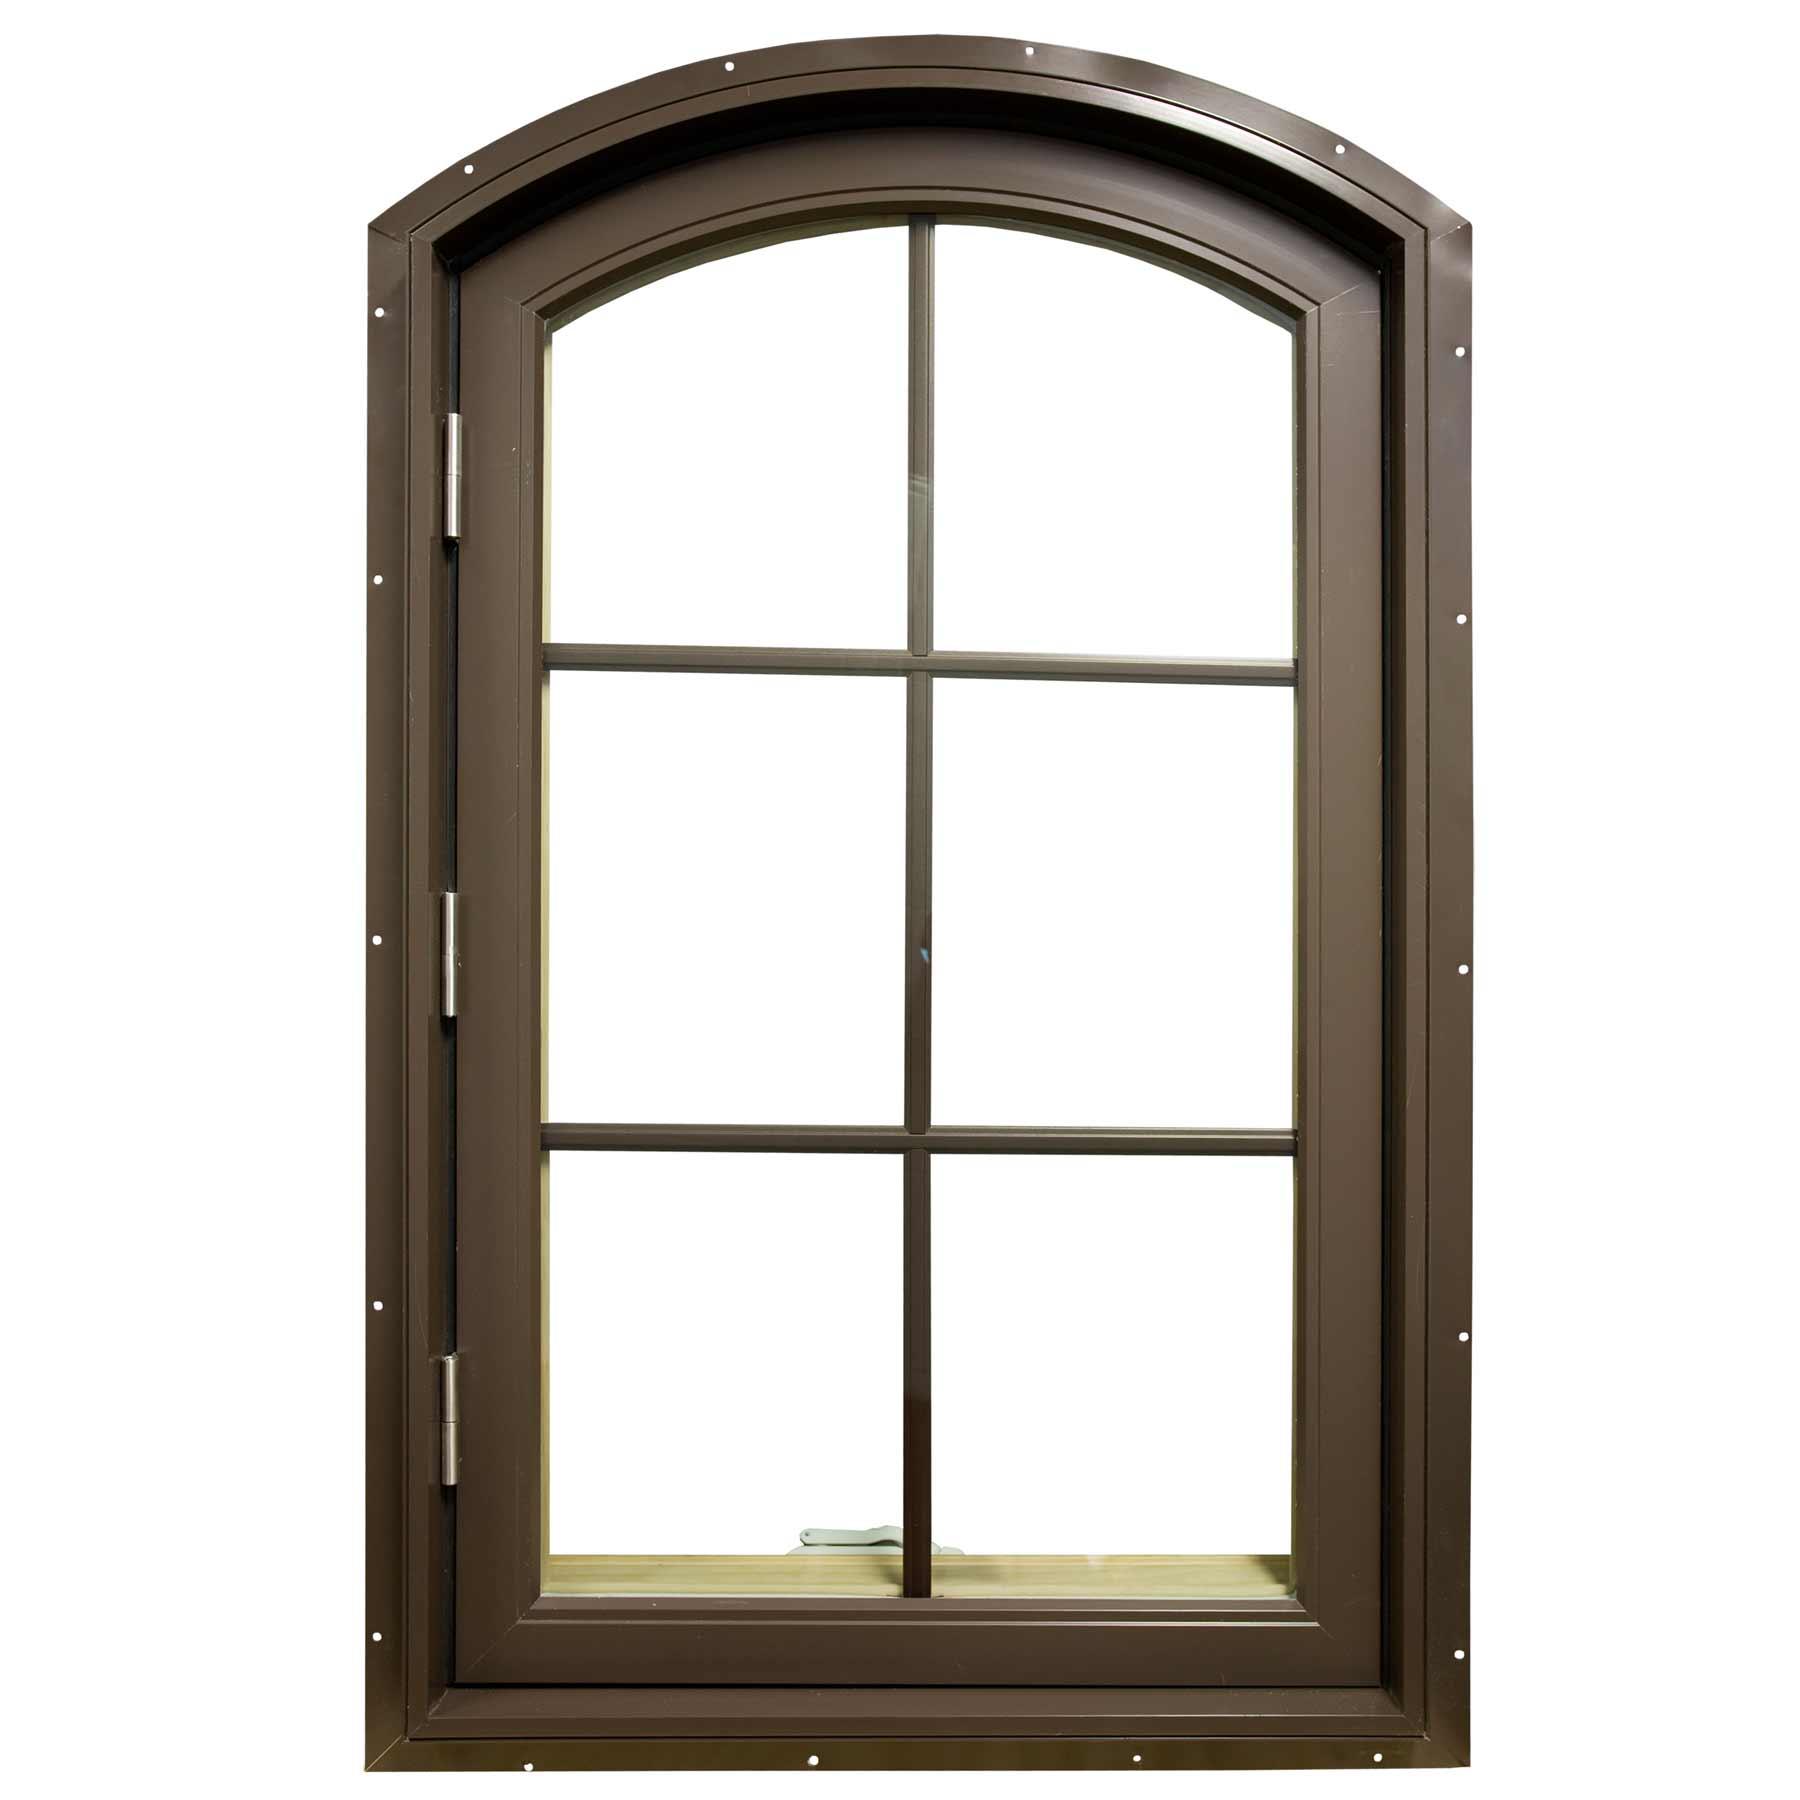 Ply Gen home aluminum casement windows